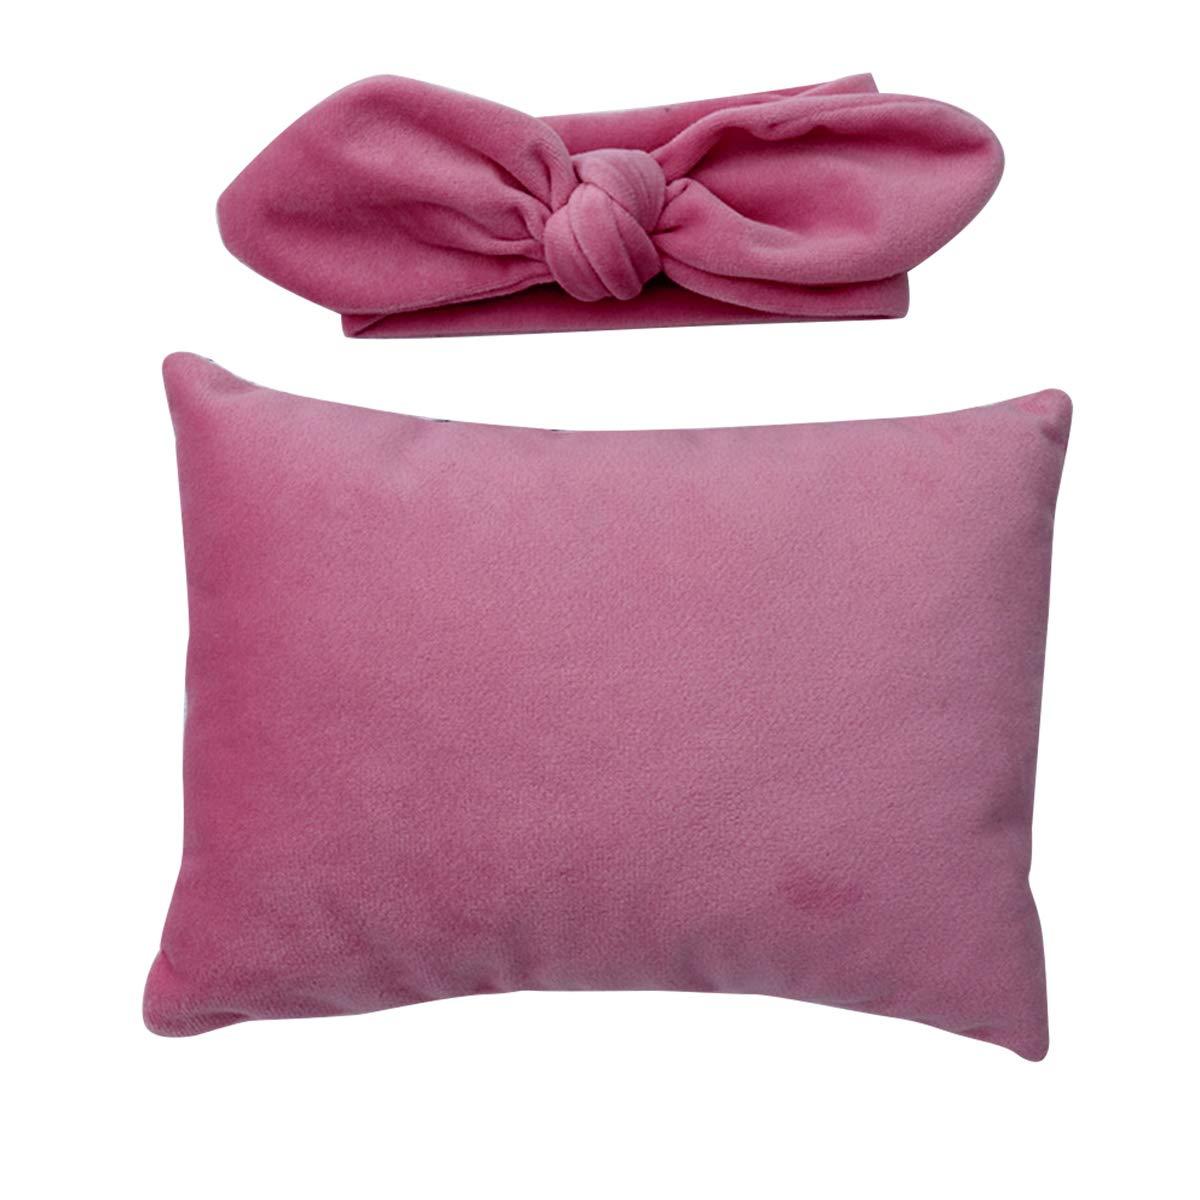 Owlike 2pcs/lot Baby Super Soft Velvet Posing Pillow + Headband Newborn Photography Props - Cameo